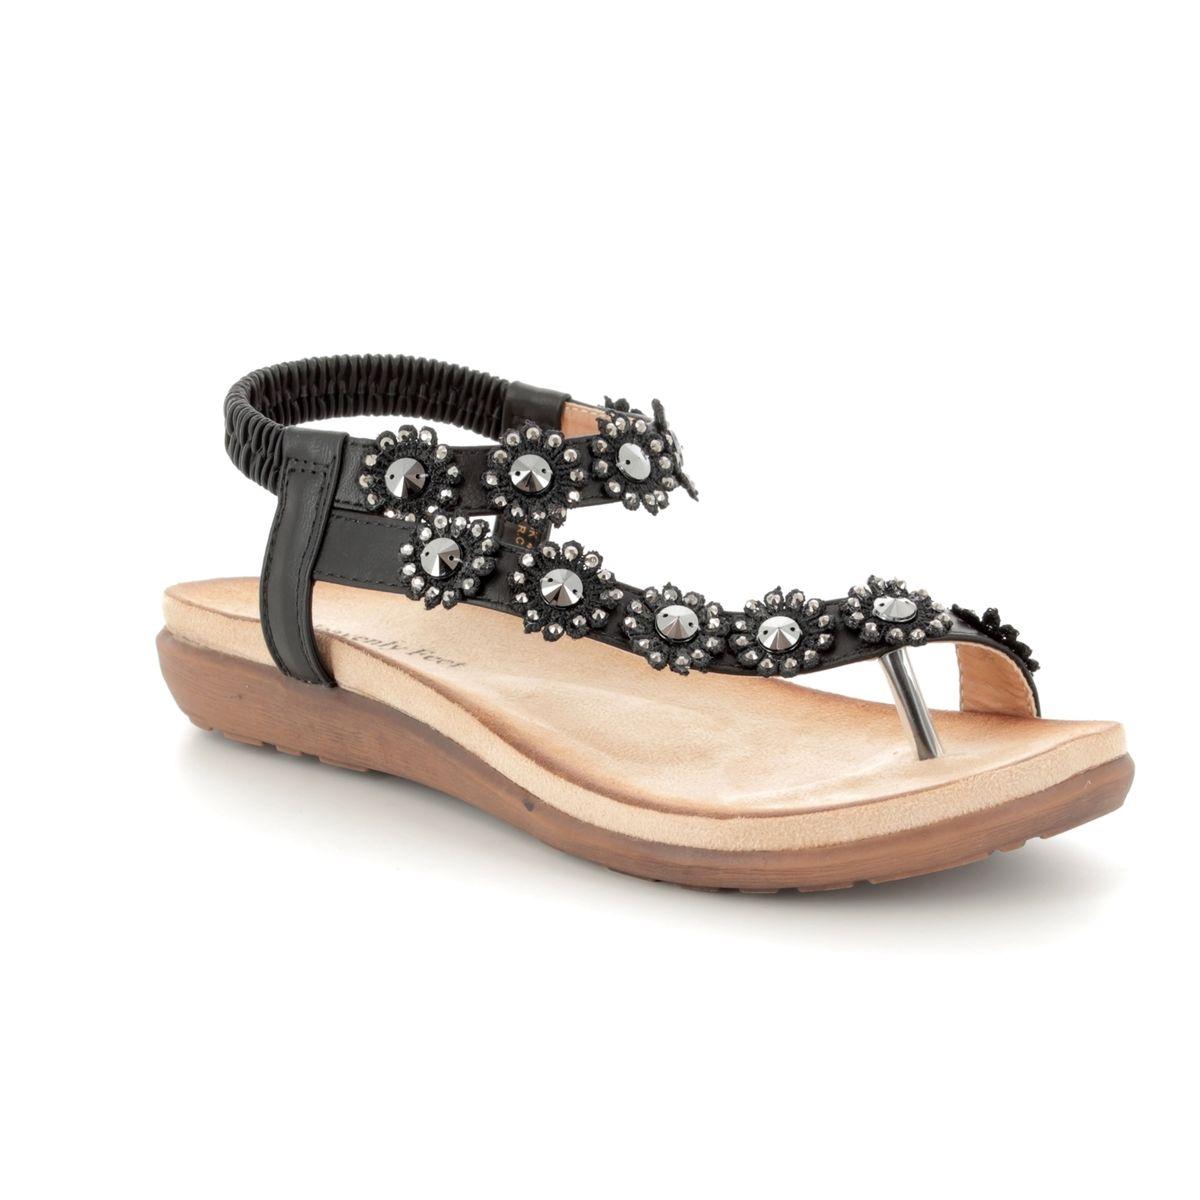 7d4731c9 Heavenly Feet Sandals - Black - 8112/30 LULU